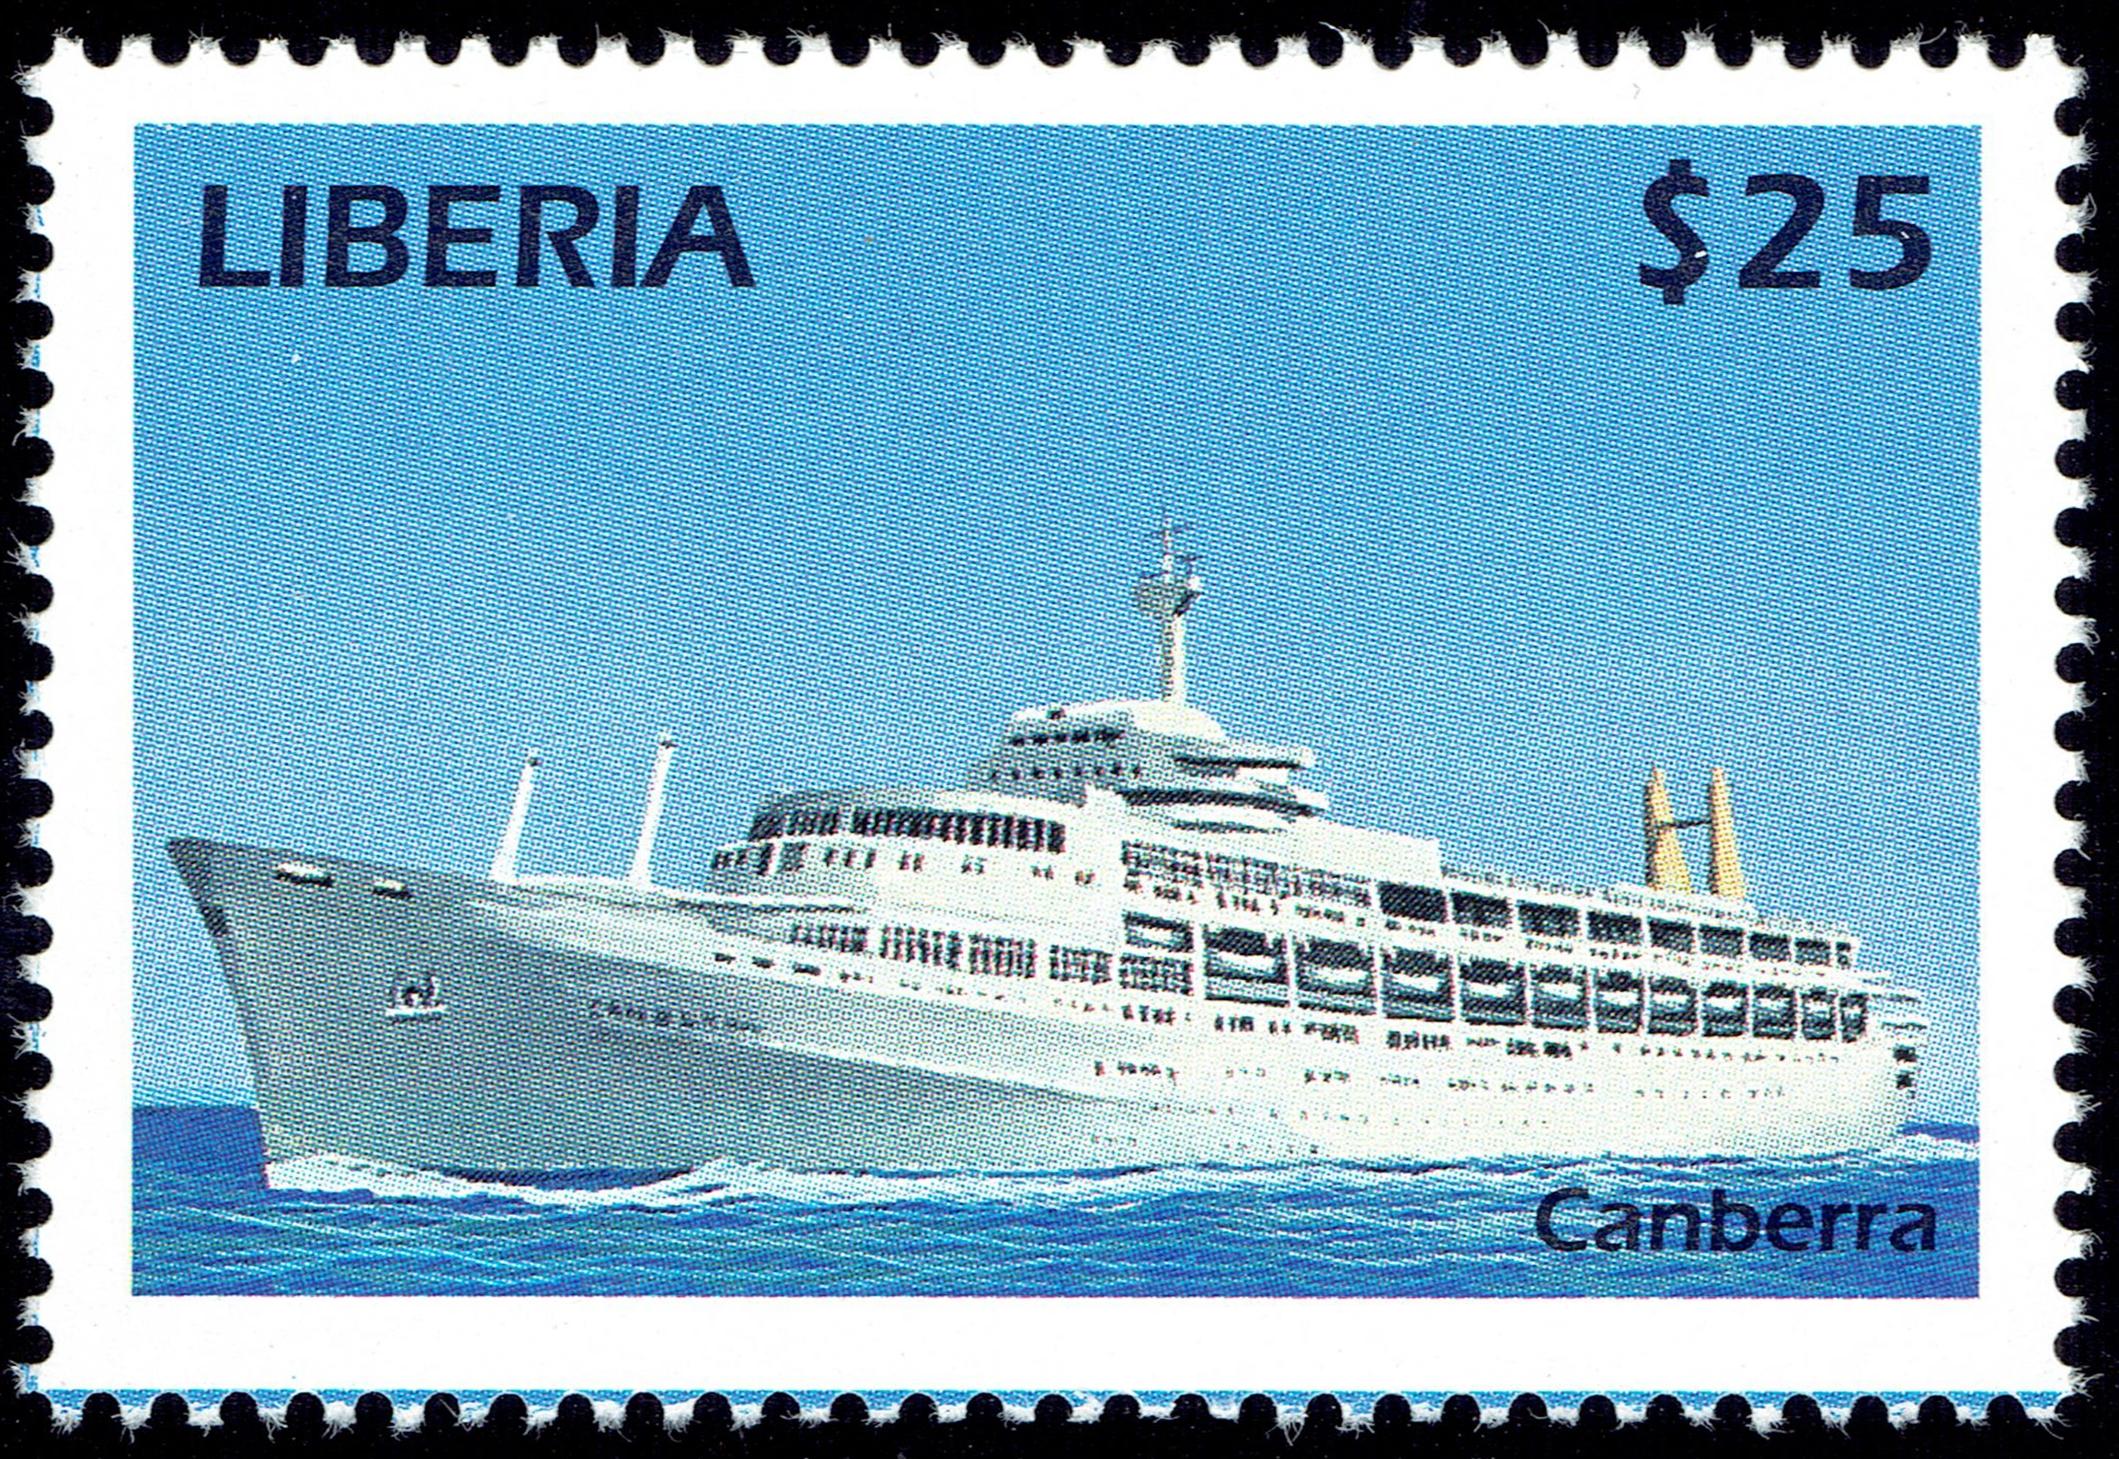 Liberia - StampWorld #2633 (1999)